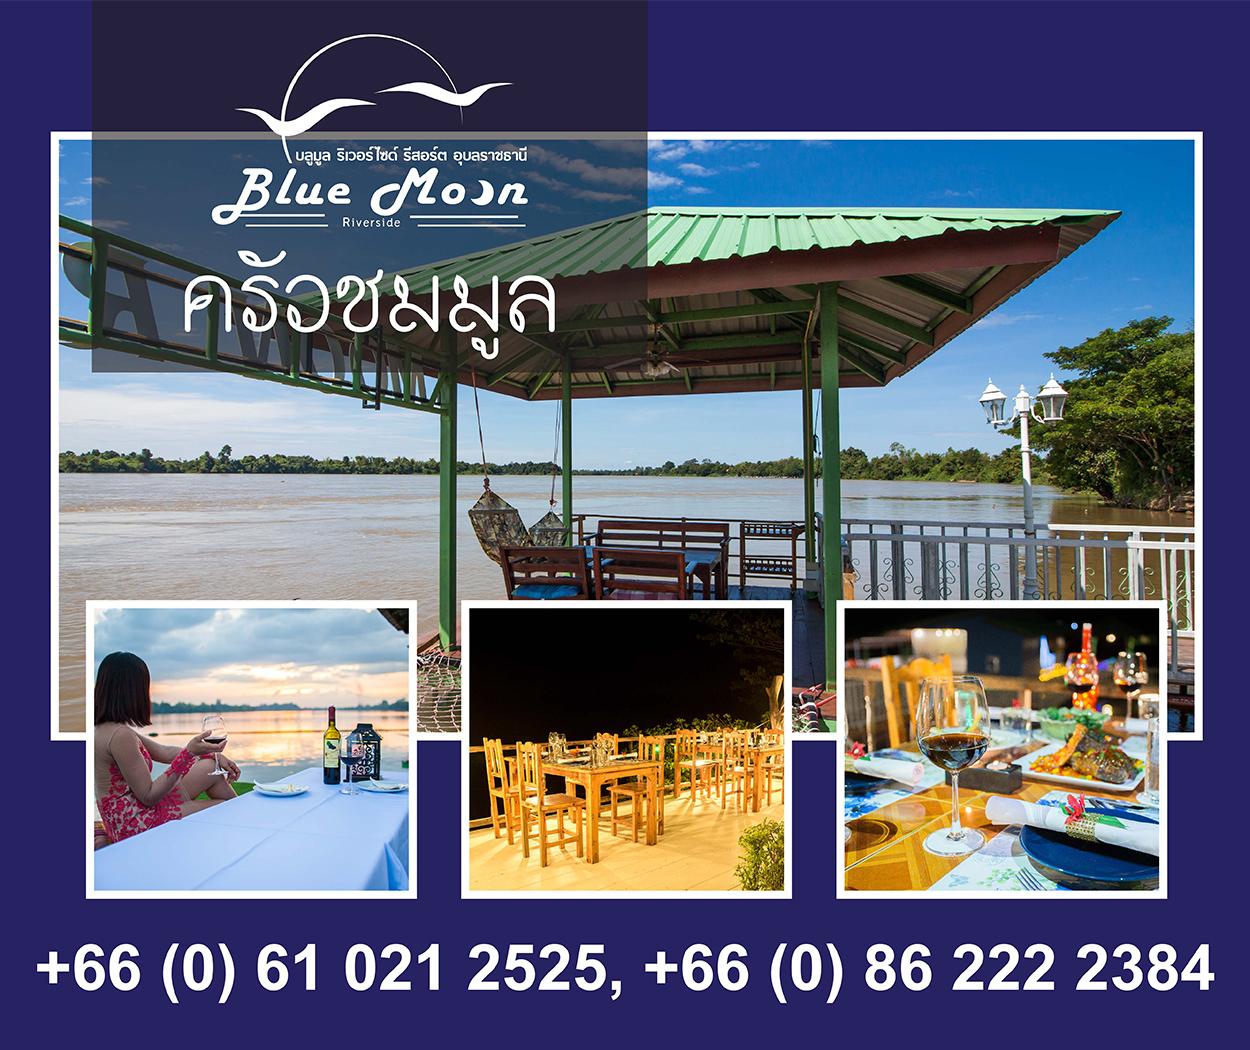 Bluemoon Riverside Resort Ubon Ratchathani Chommoon